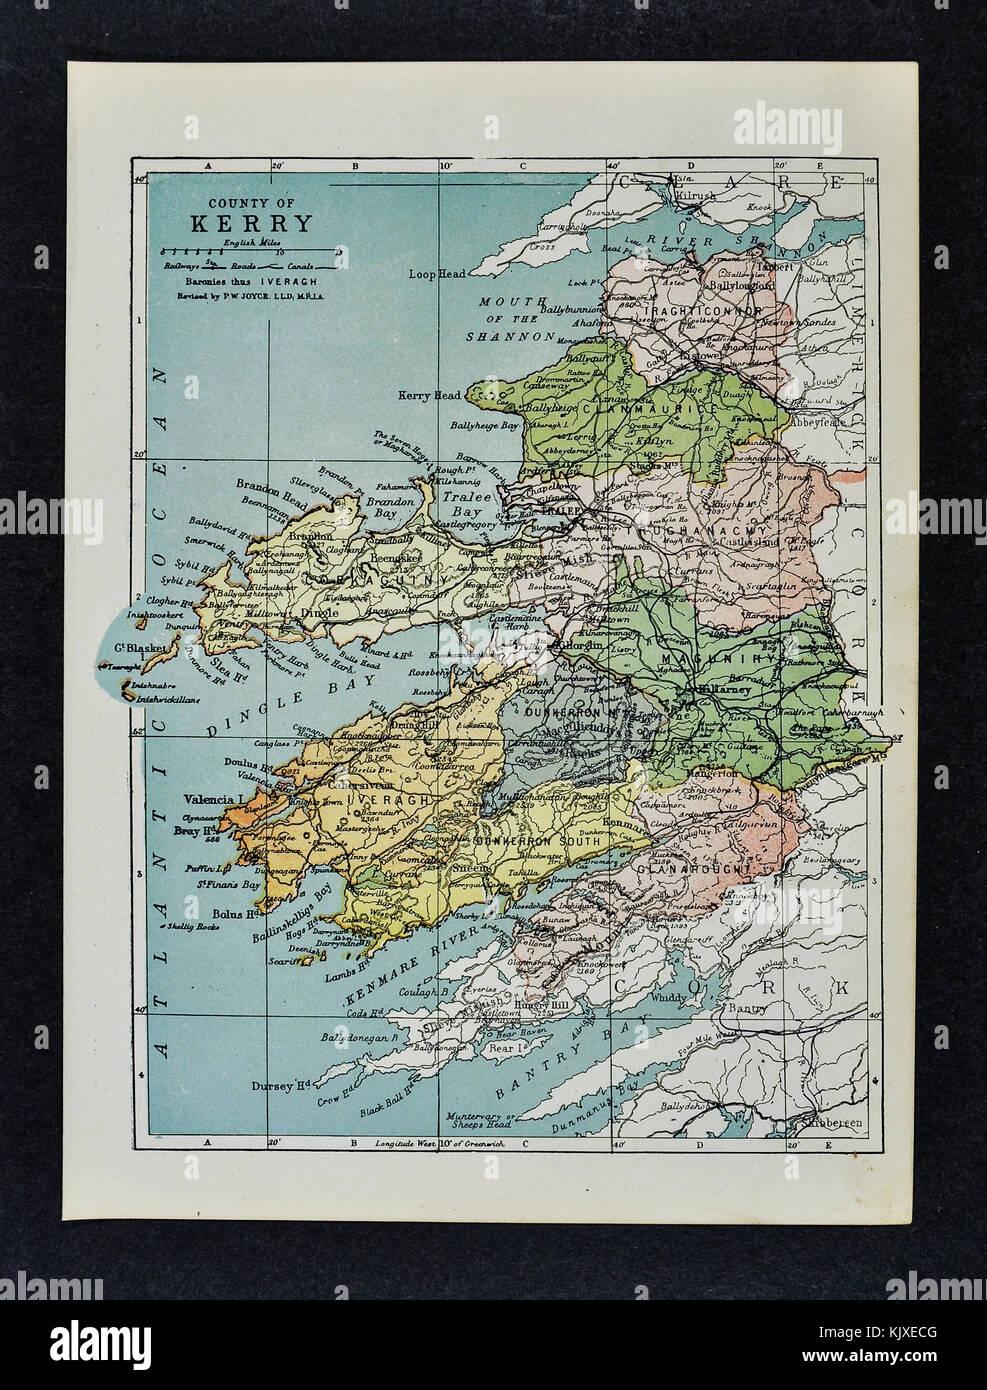 Antique Ireland Map Kerry County Killarney Listowel Tralee Stock